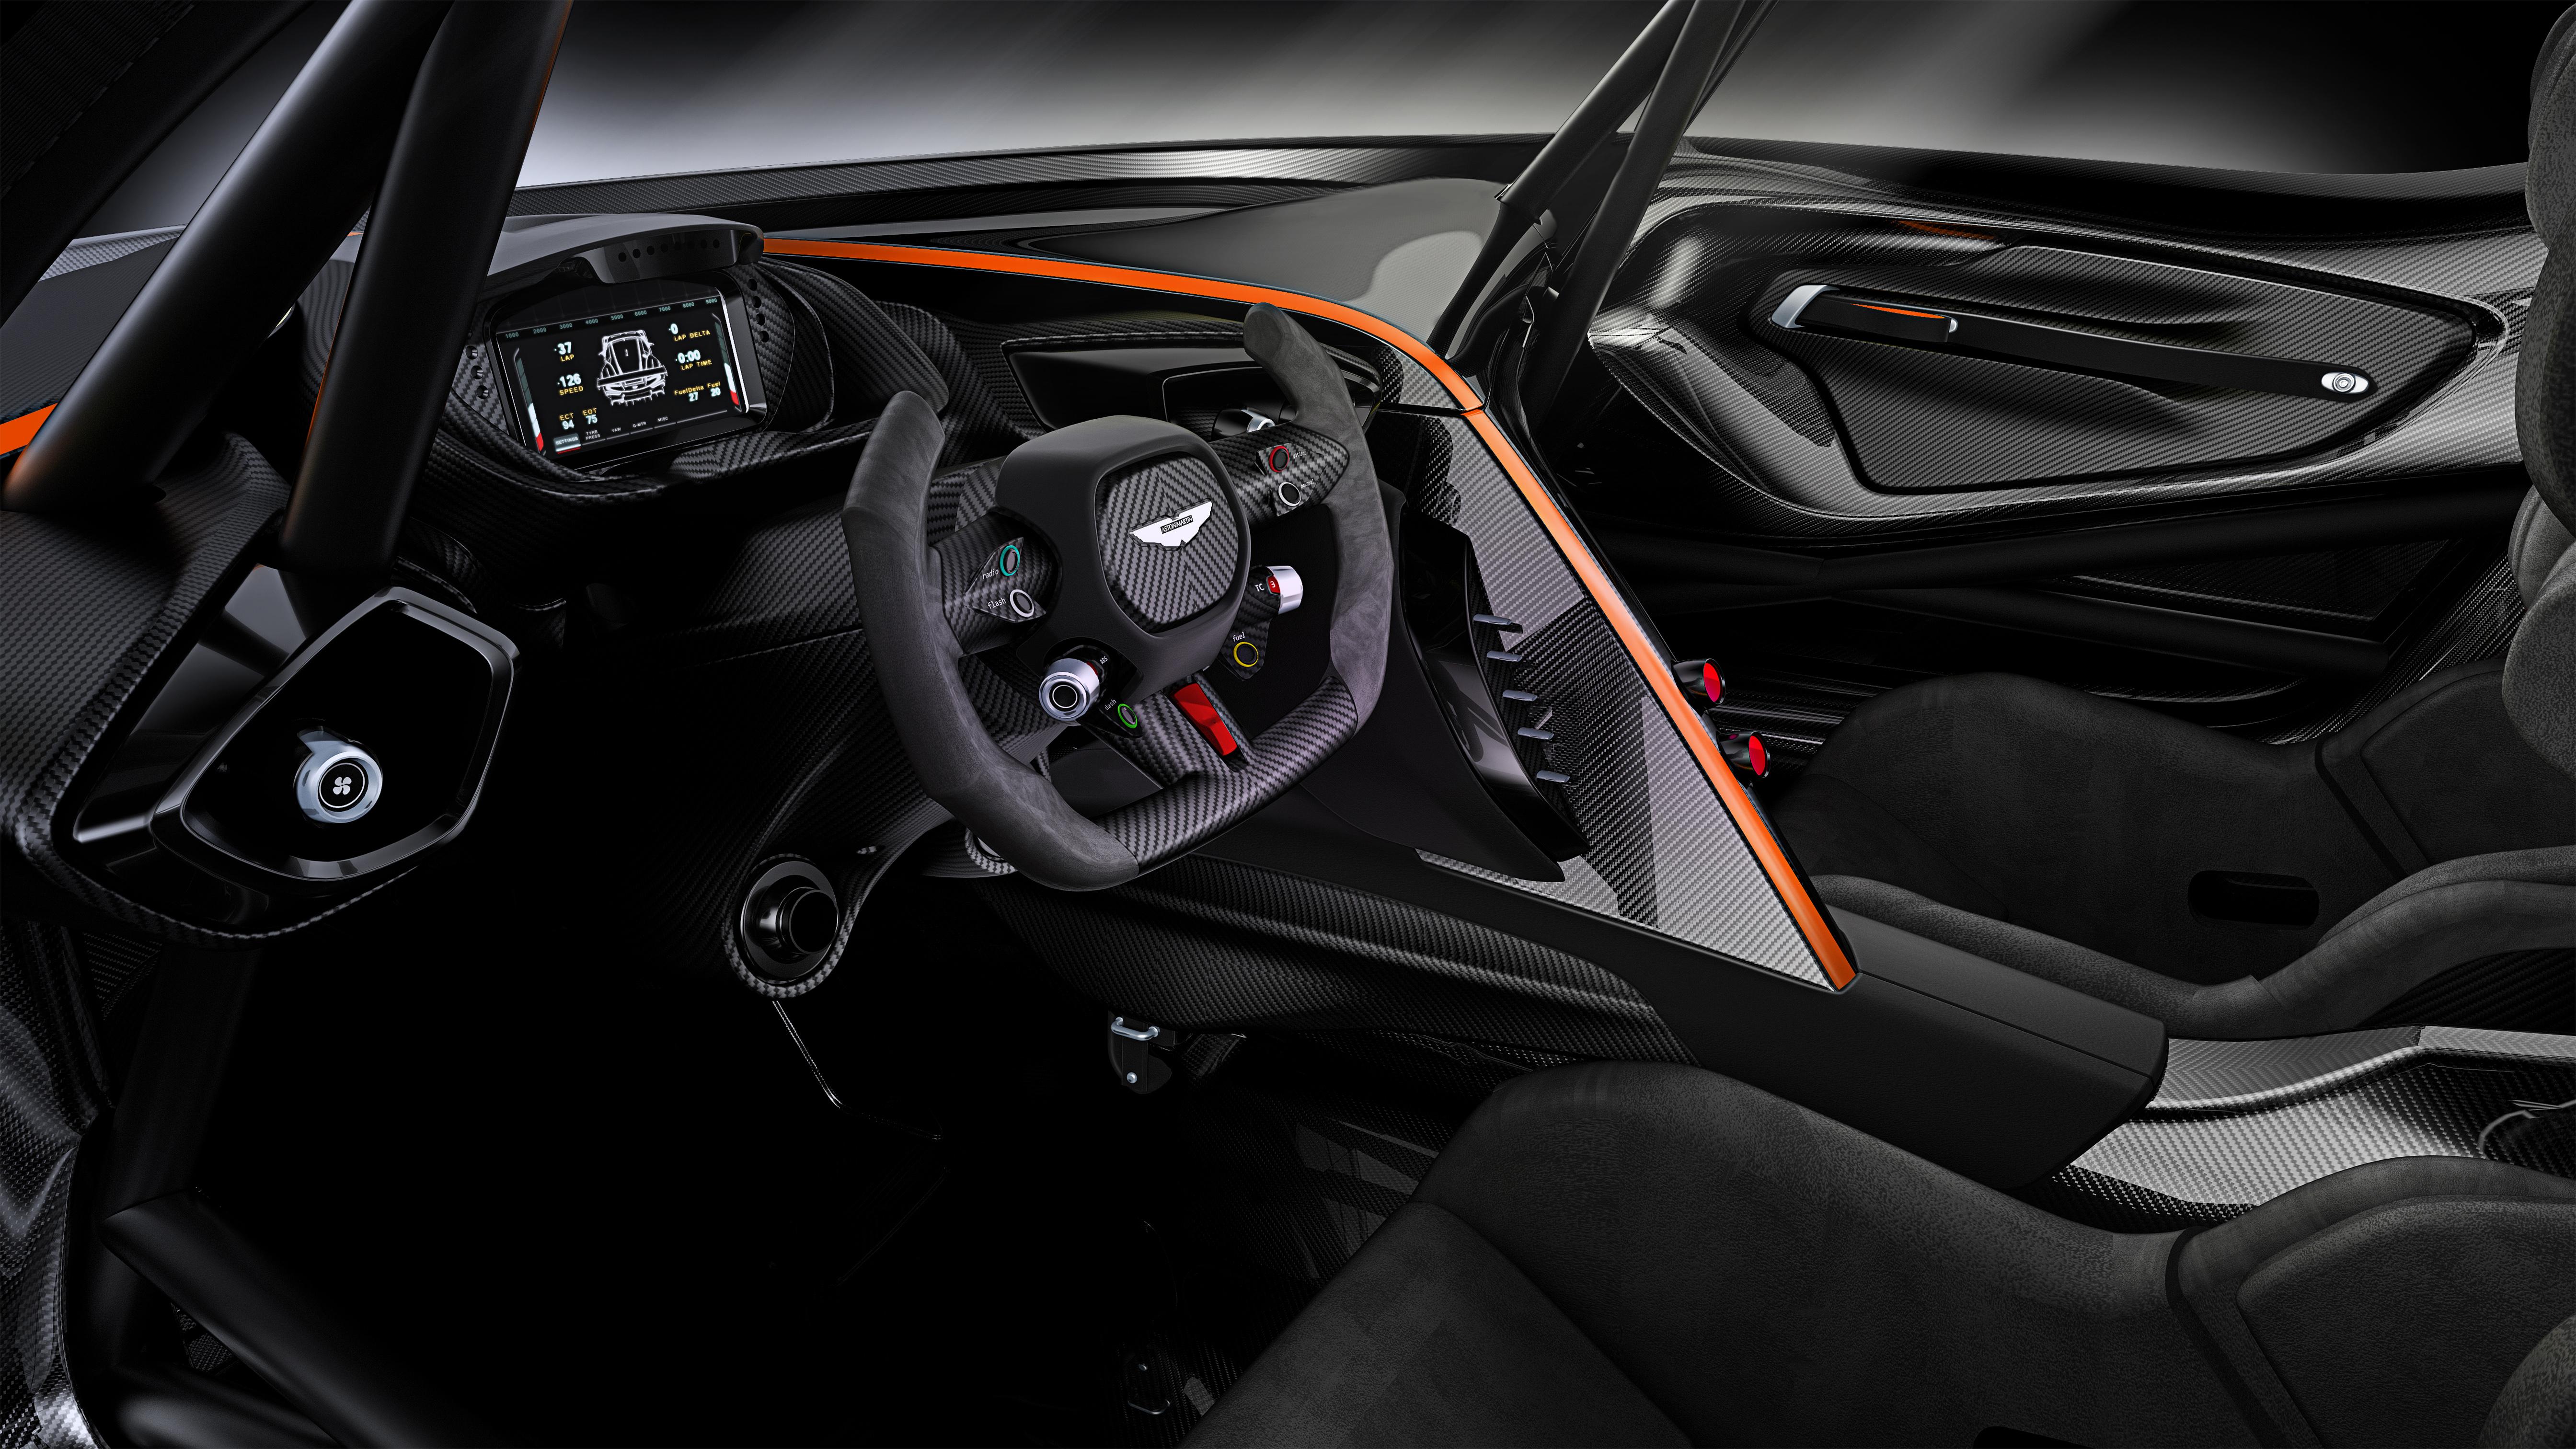 Aston Martin Vulcan Interior 5k Retina Ultra Hd Wallpaper Hintergrund 5376x3024 Id 891830 Wallpaper Abyss